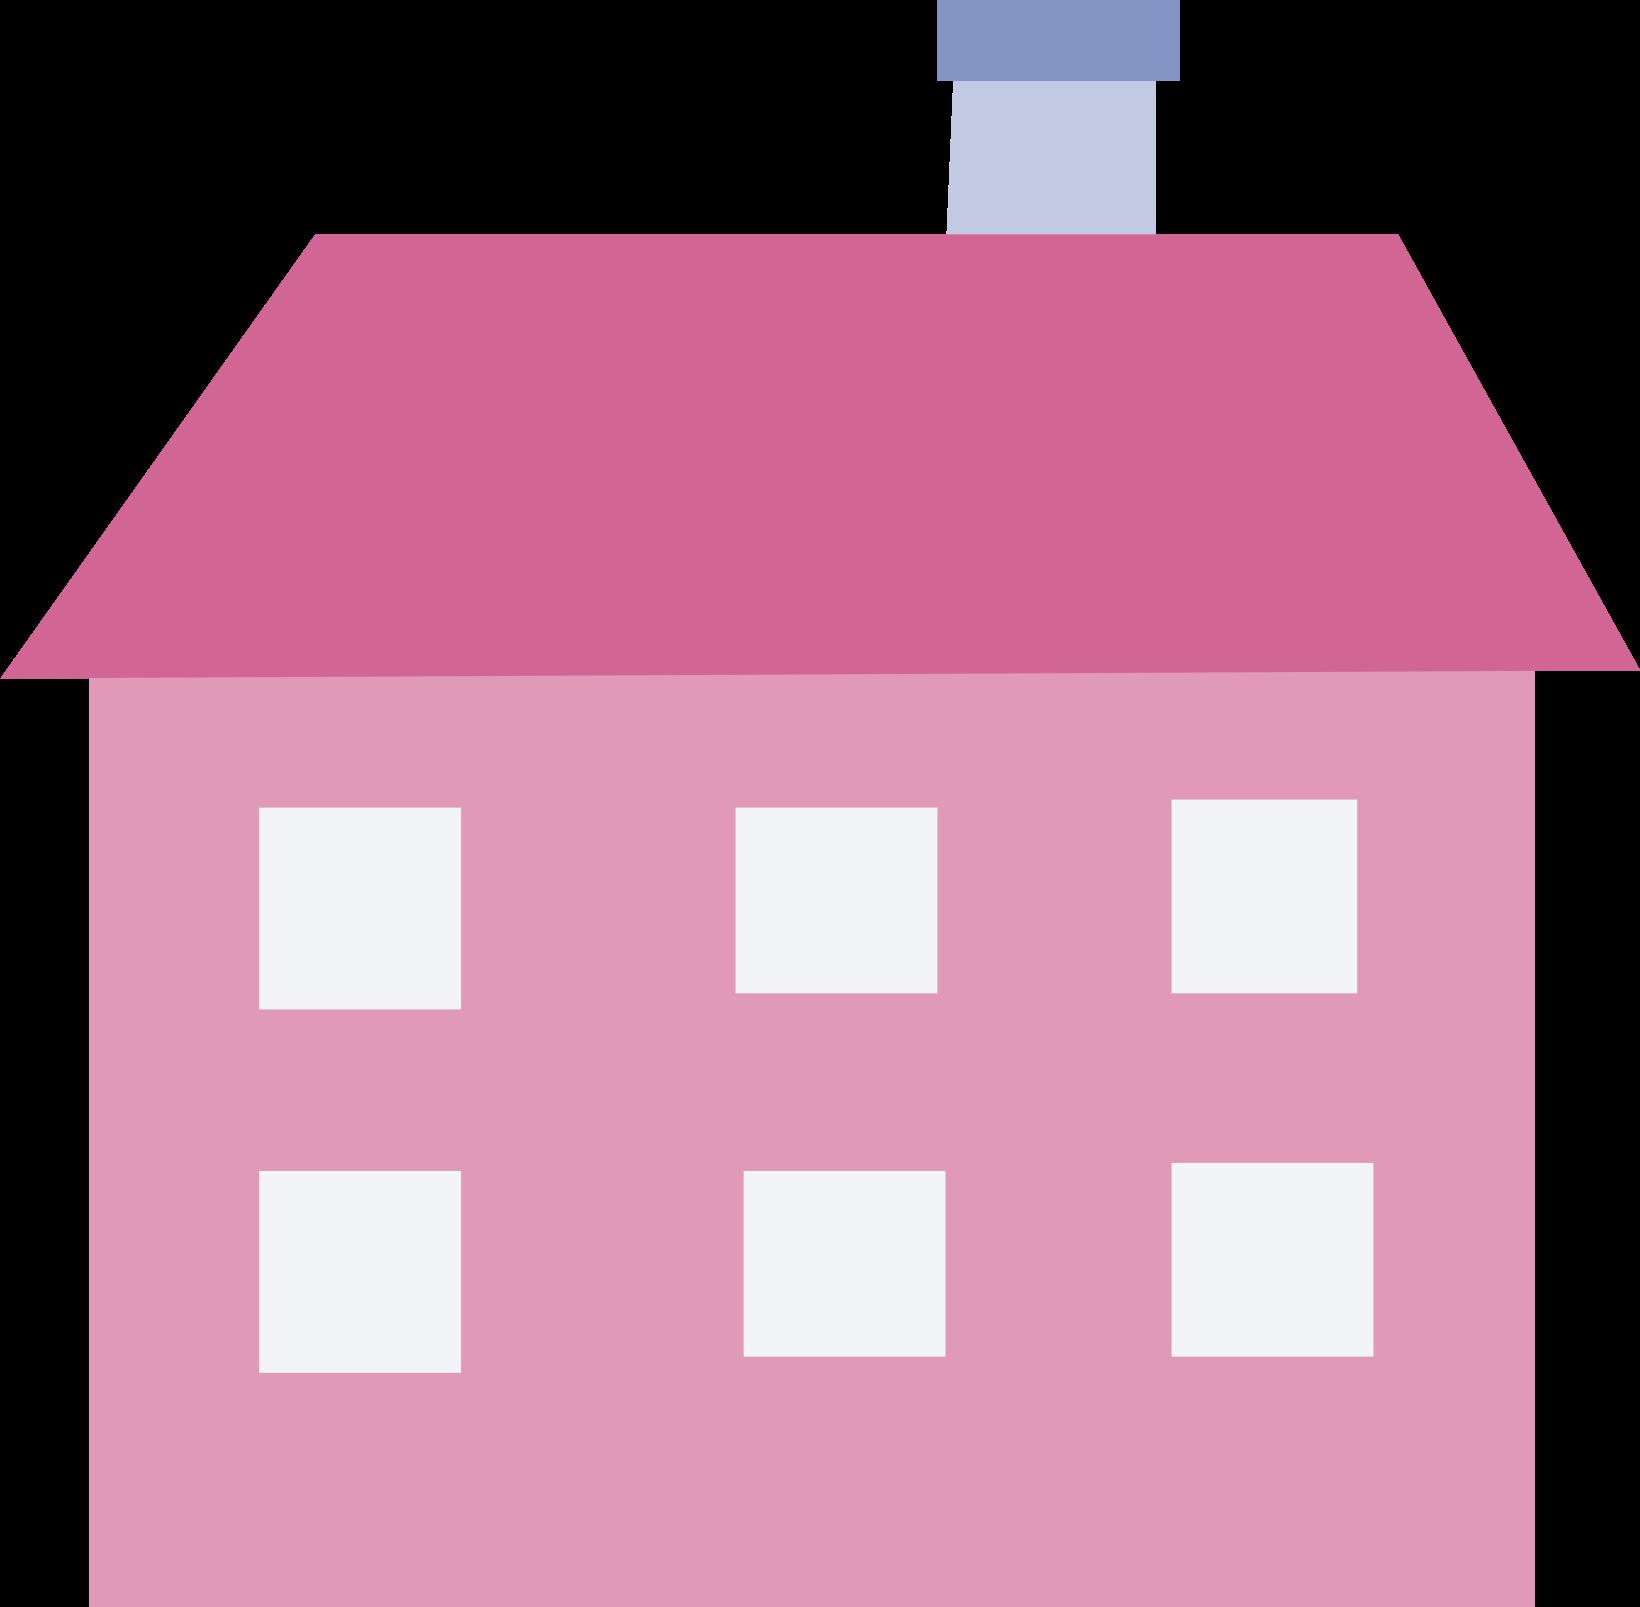 Purple house clipart jpg freeuse Clipart - House 03 jpg freeuse